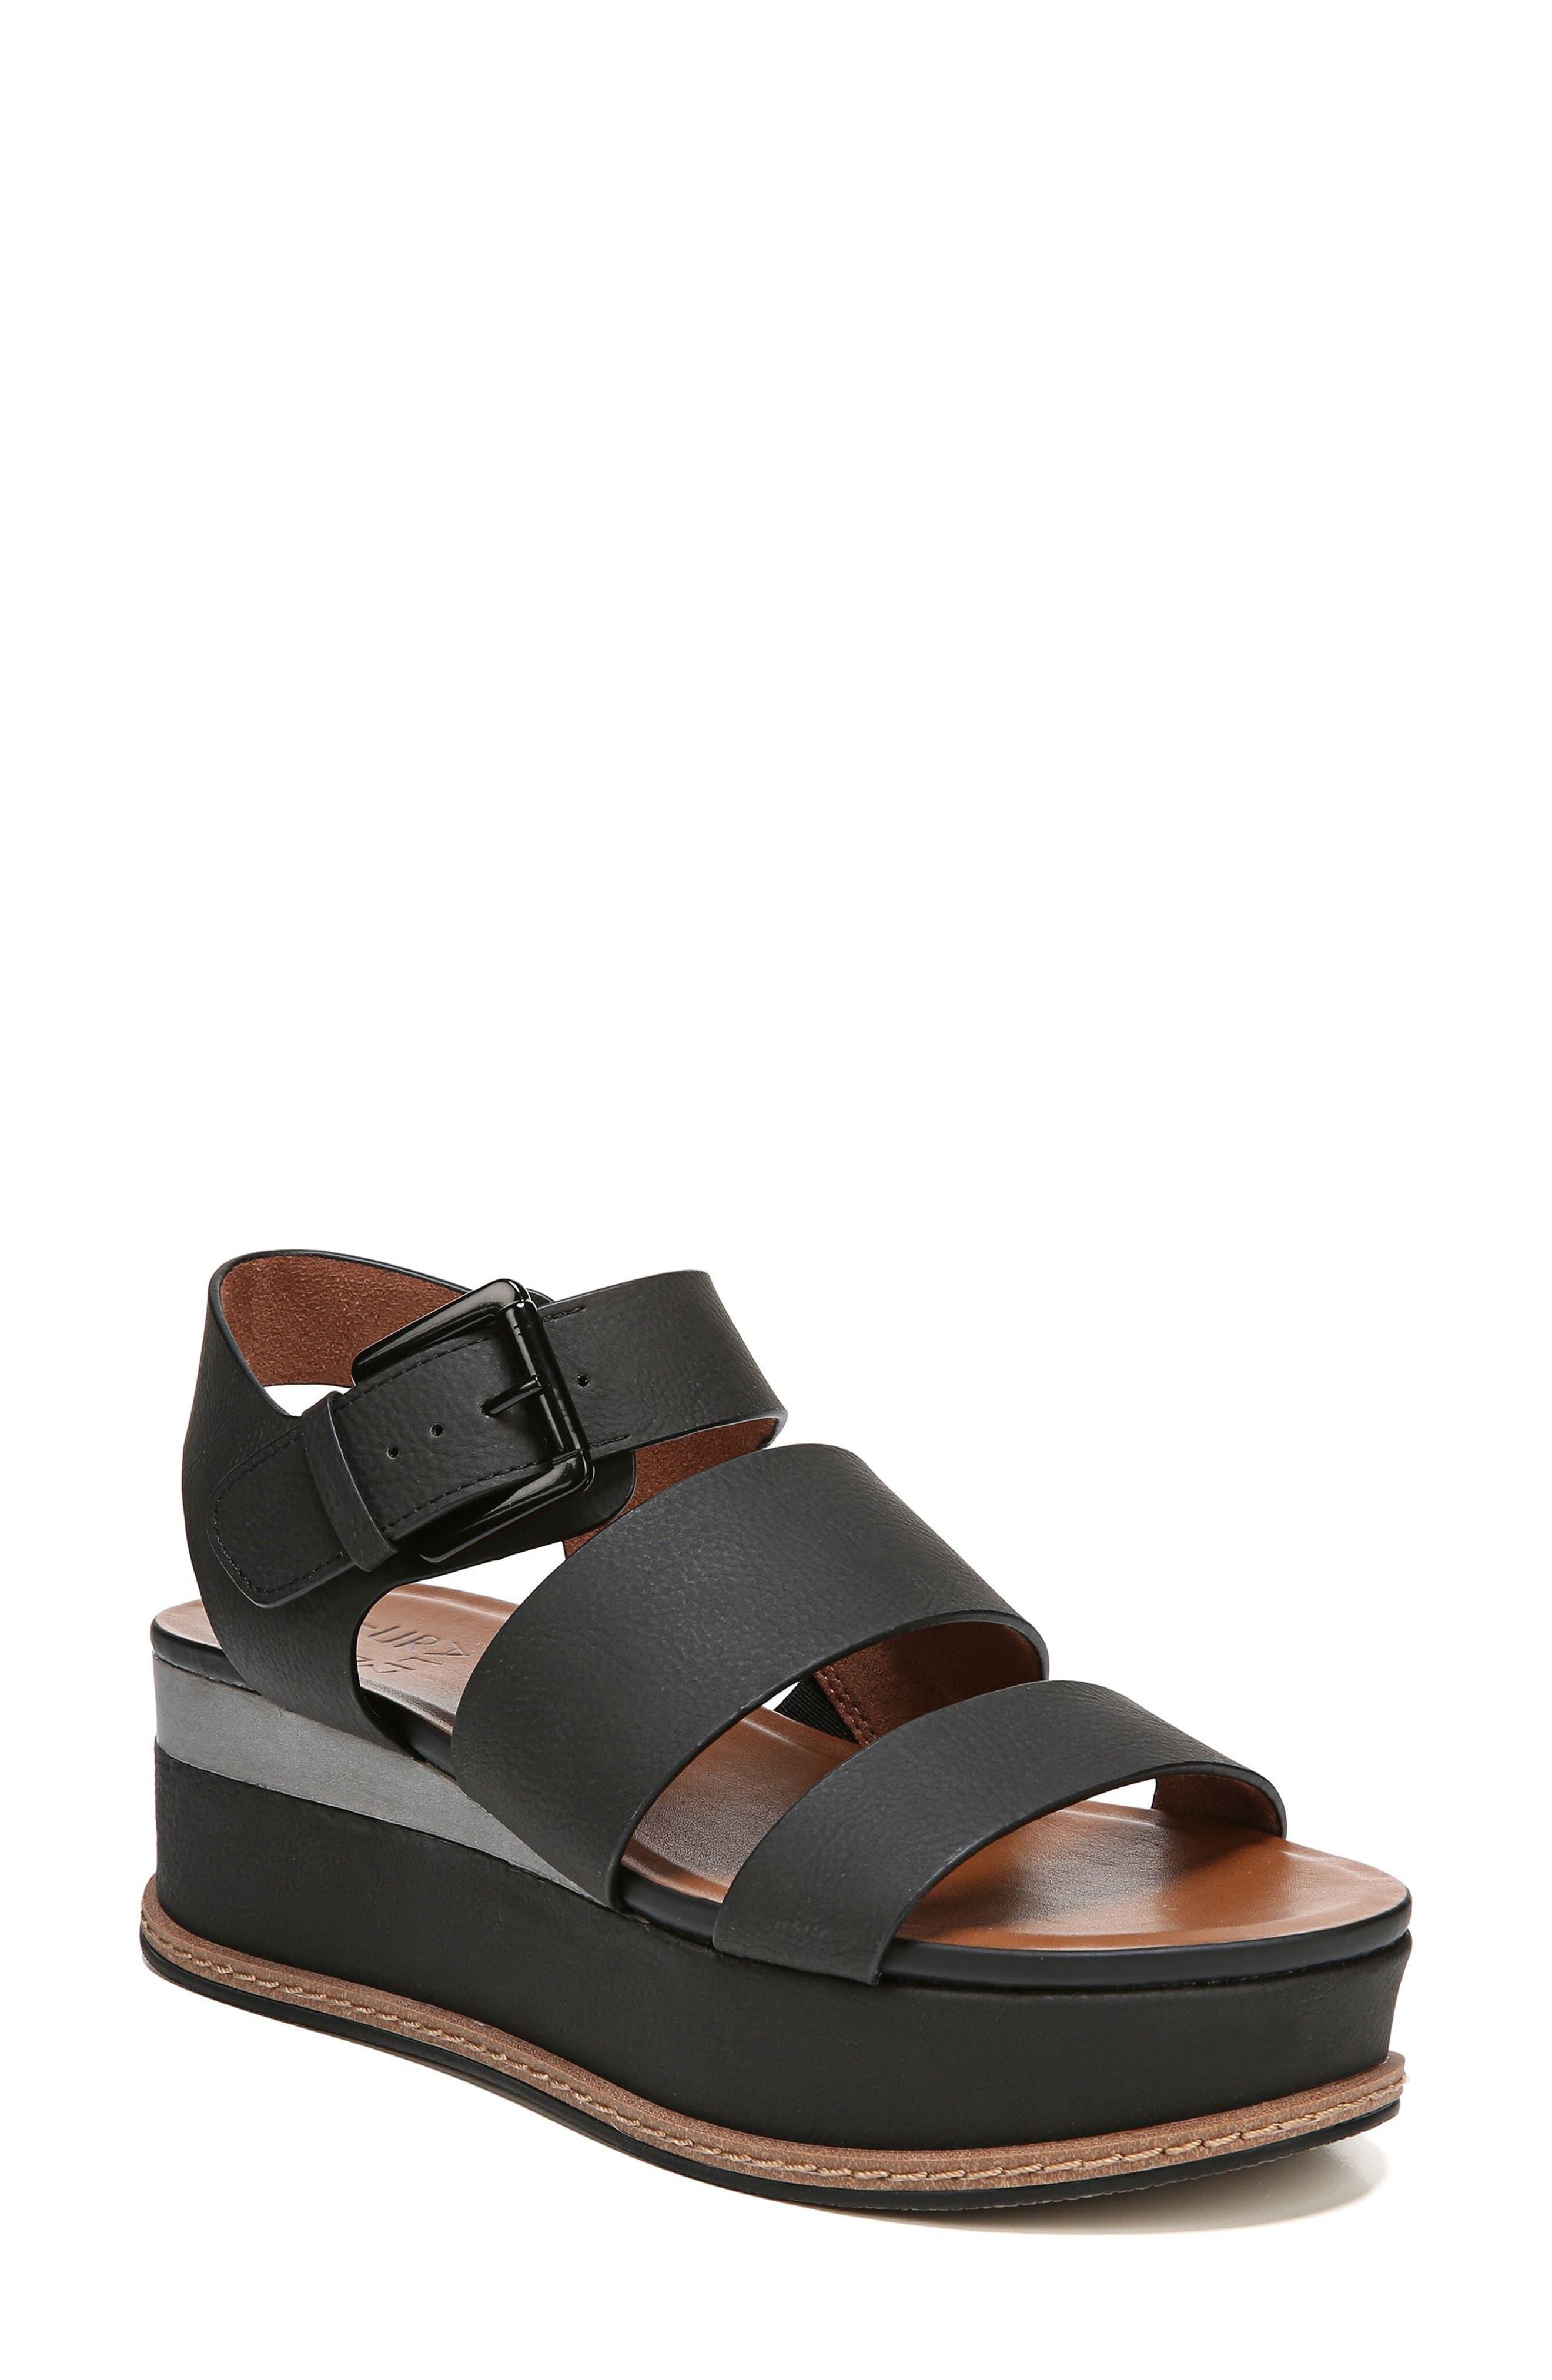 NATURALIZER Billie Platform Sandal, Main, color, BLACK FAUX NUBUCK LEATHER